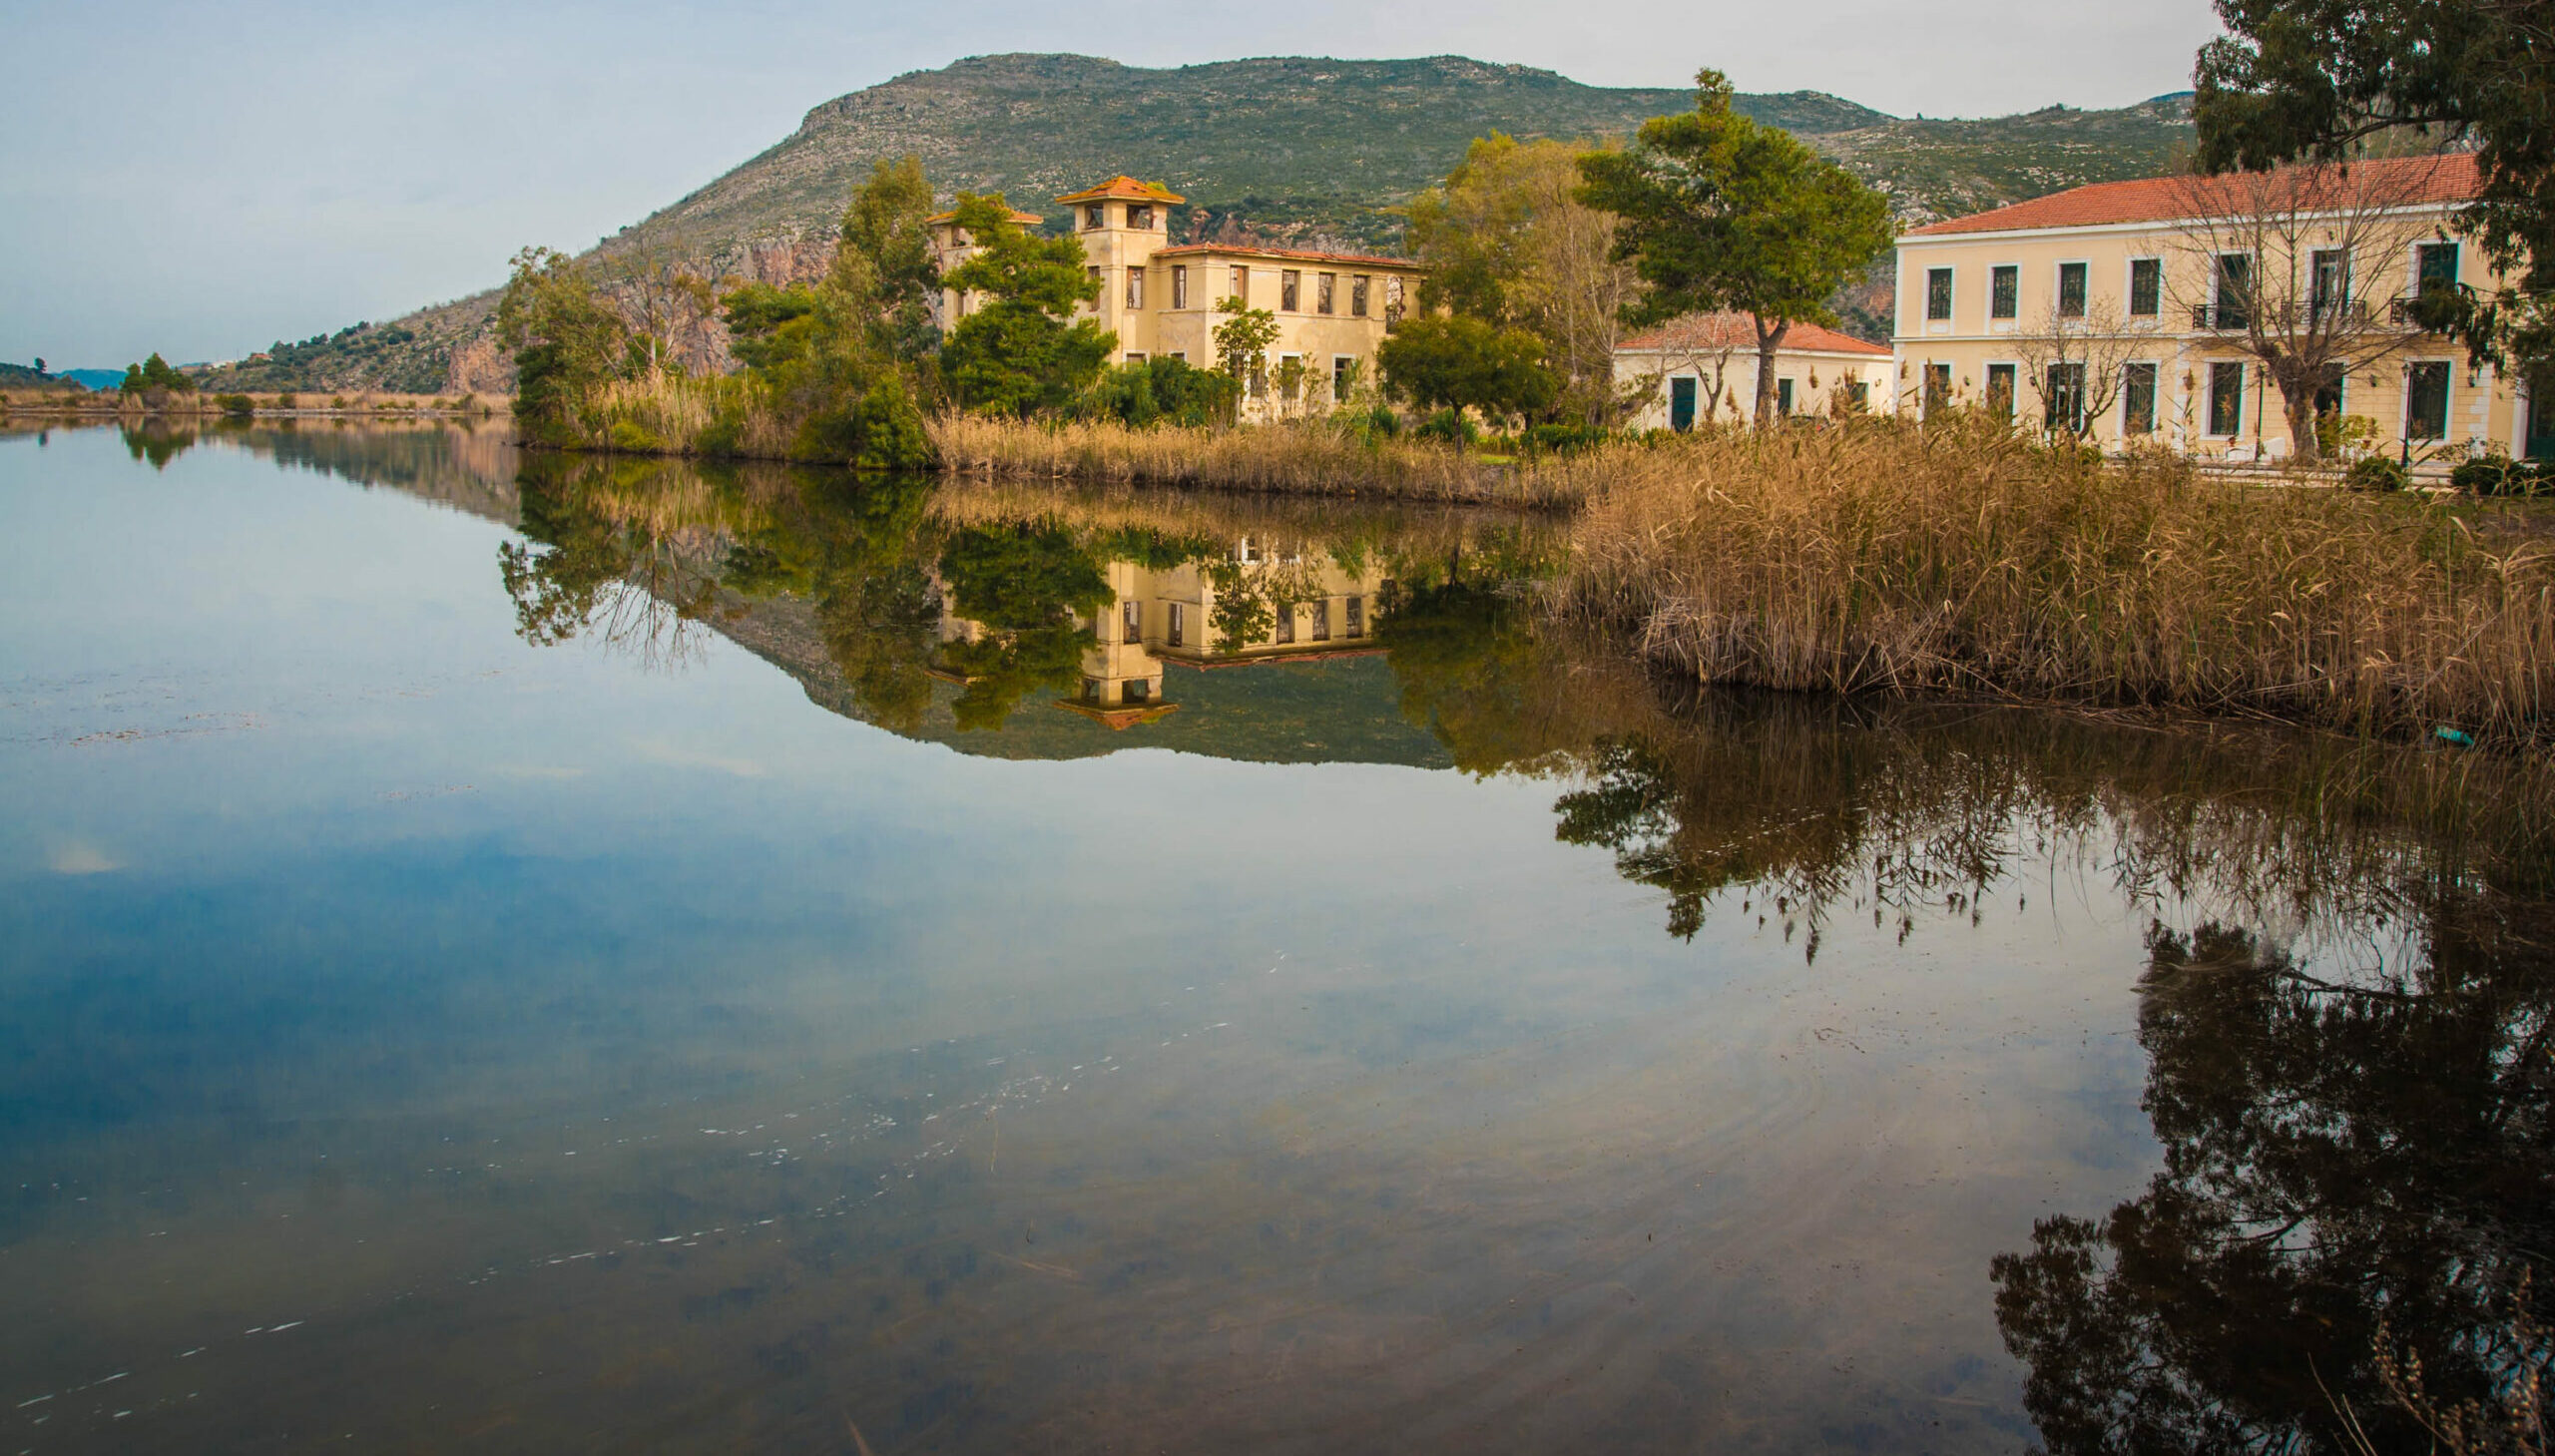 Peloponnese: Lake Kaifa, the beautiful Greek lake that seems to be joined by the sea